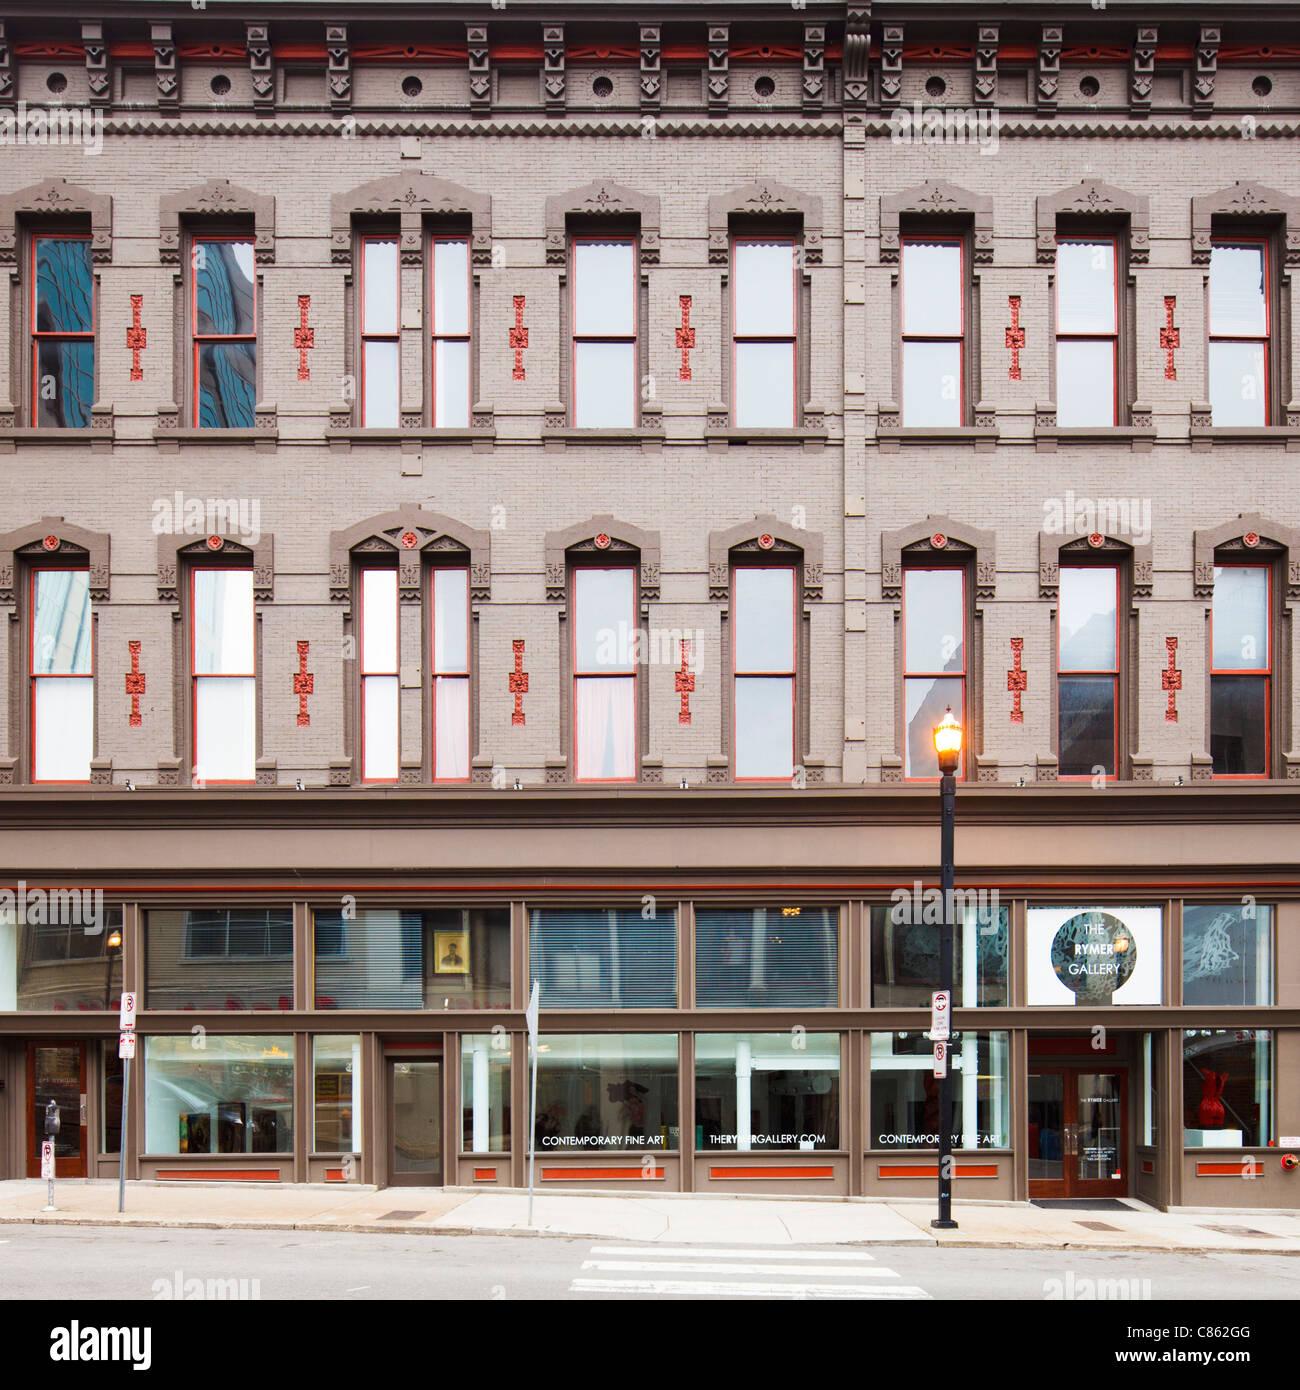 Rymer Gallery Nashville - Stock Image